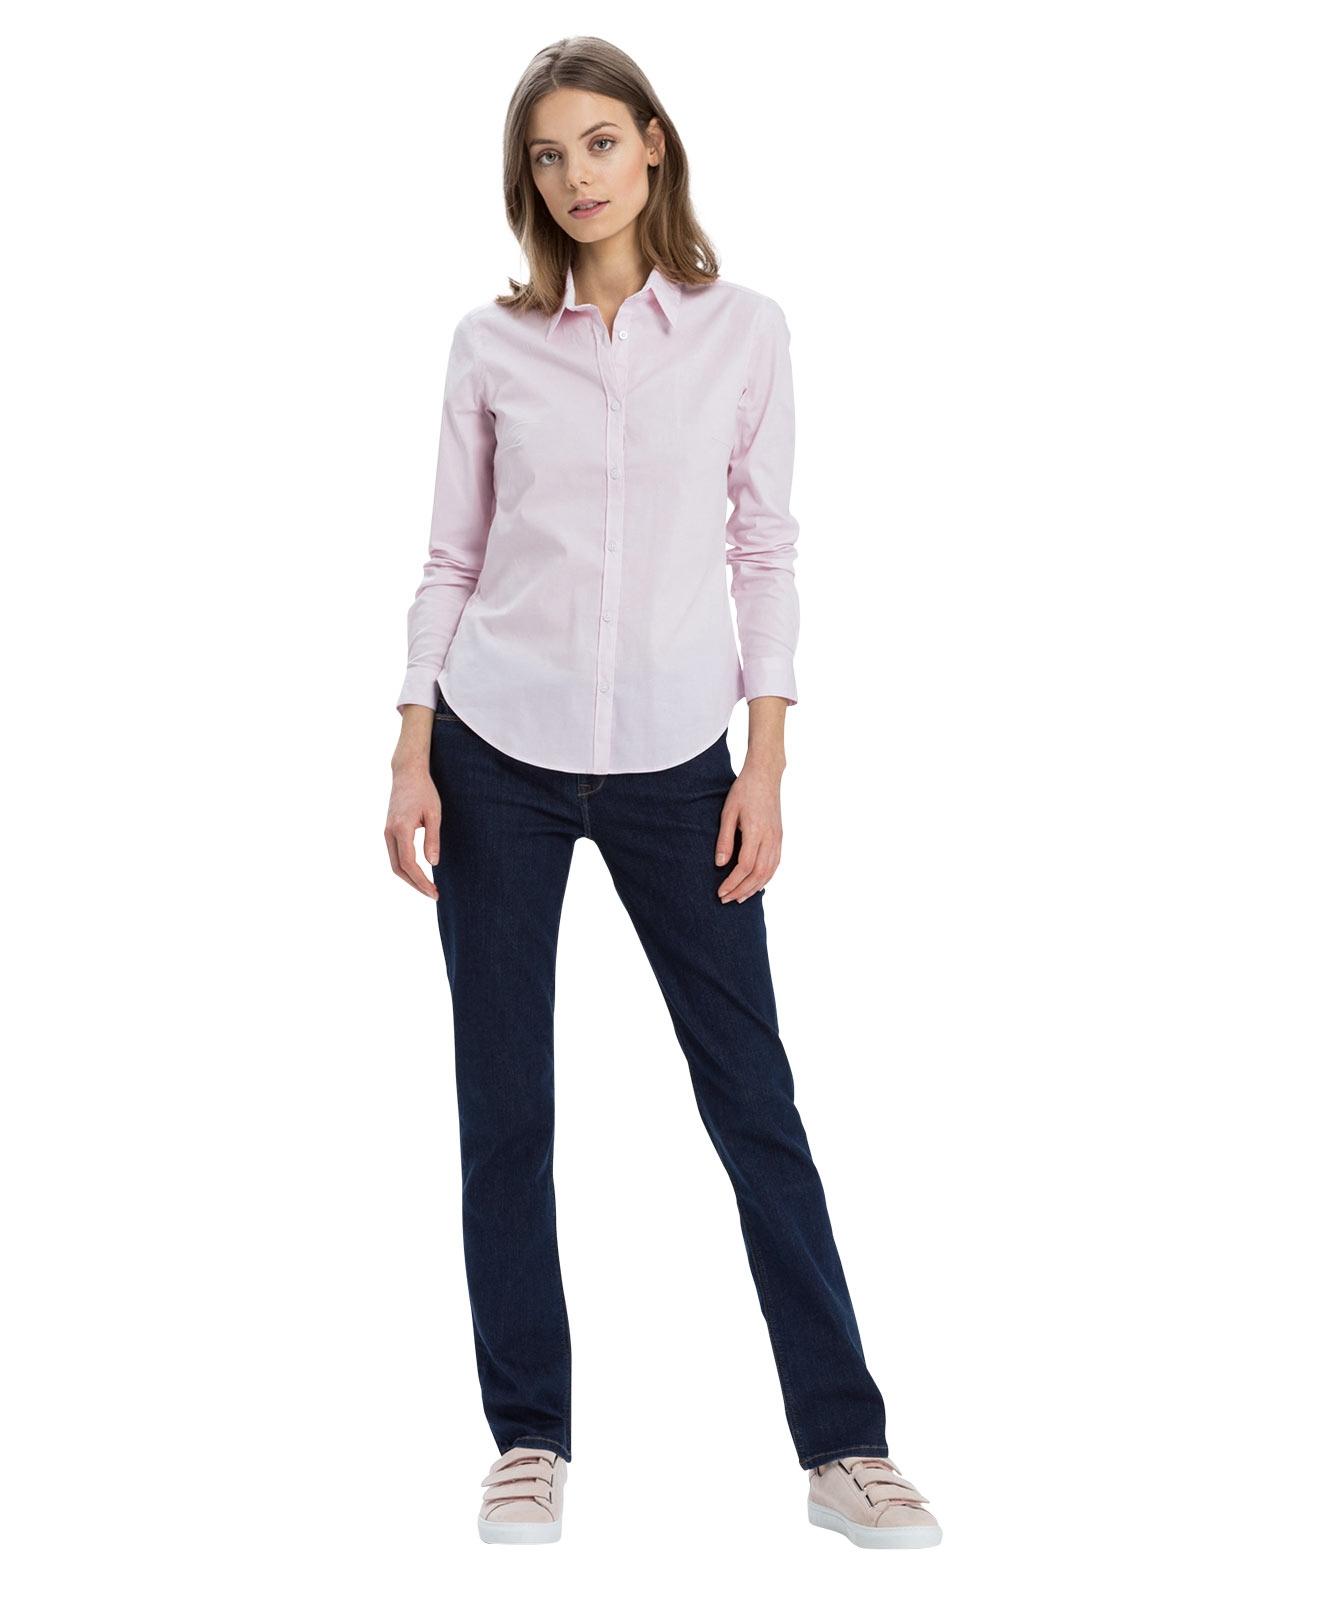 Hosen - Cross Straight Leg Jeans Rose in Clean Dark Blue  - Onlineshop Jeans Meile